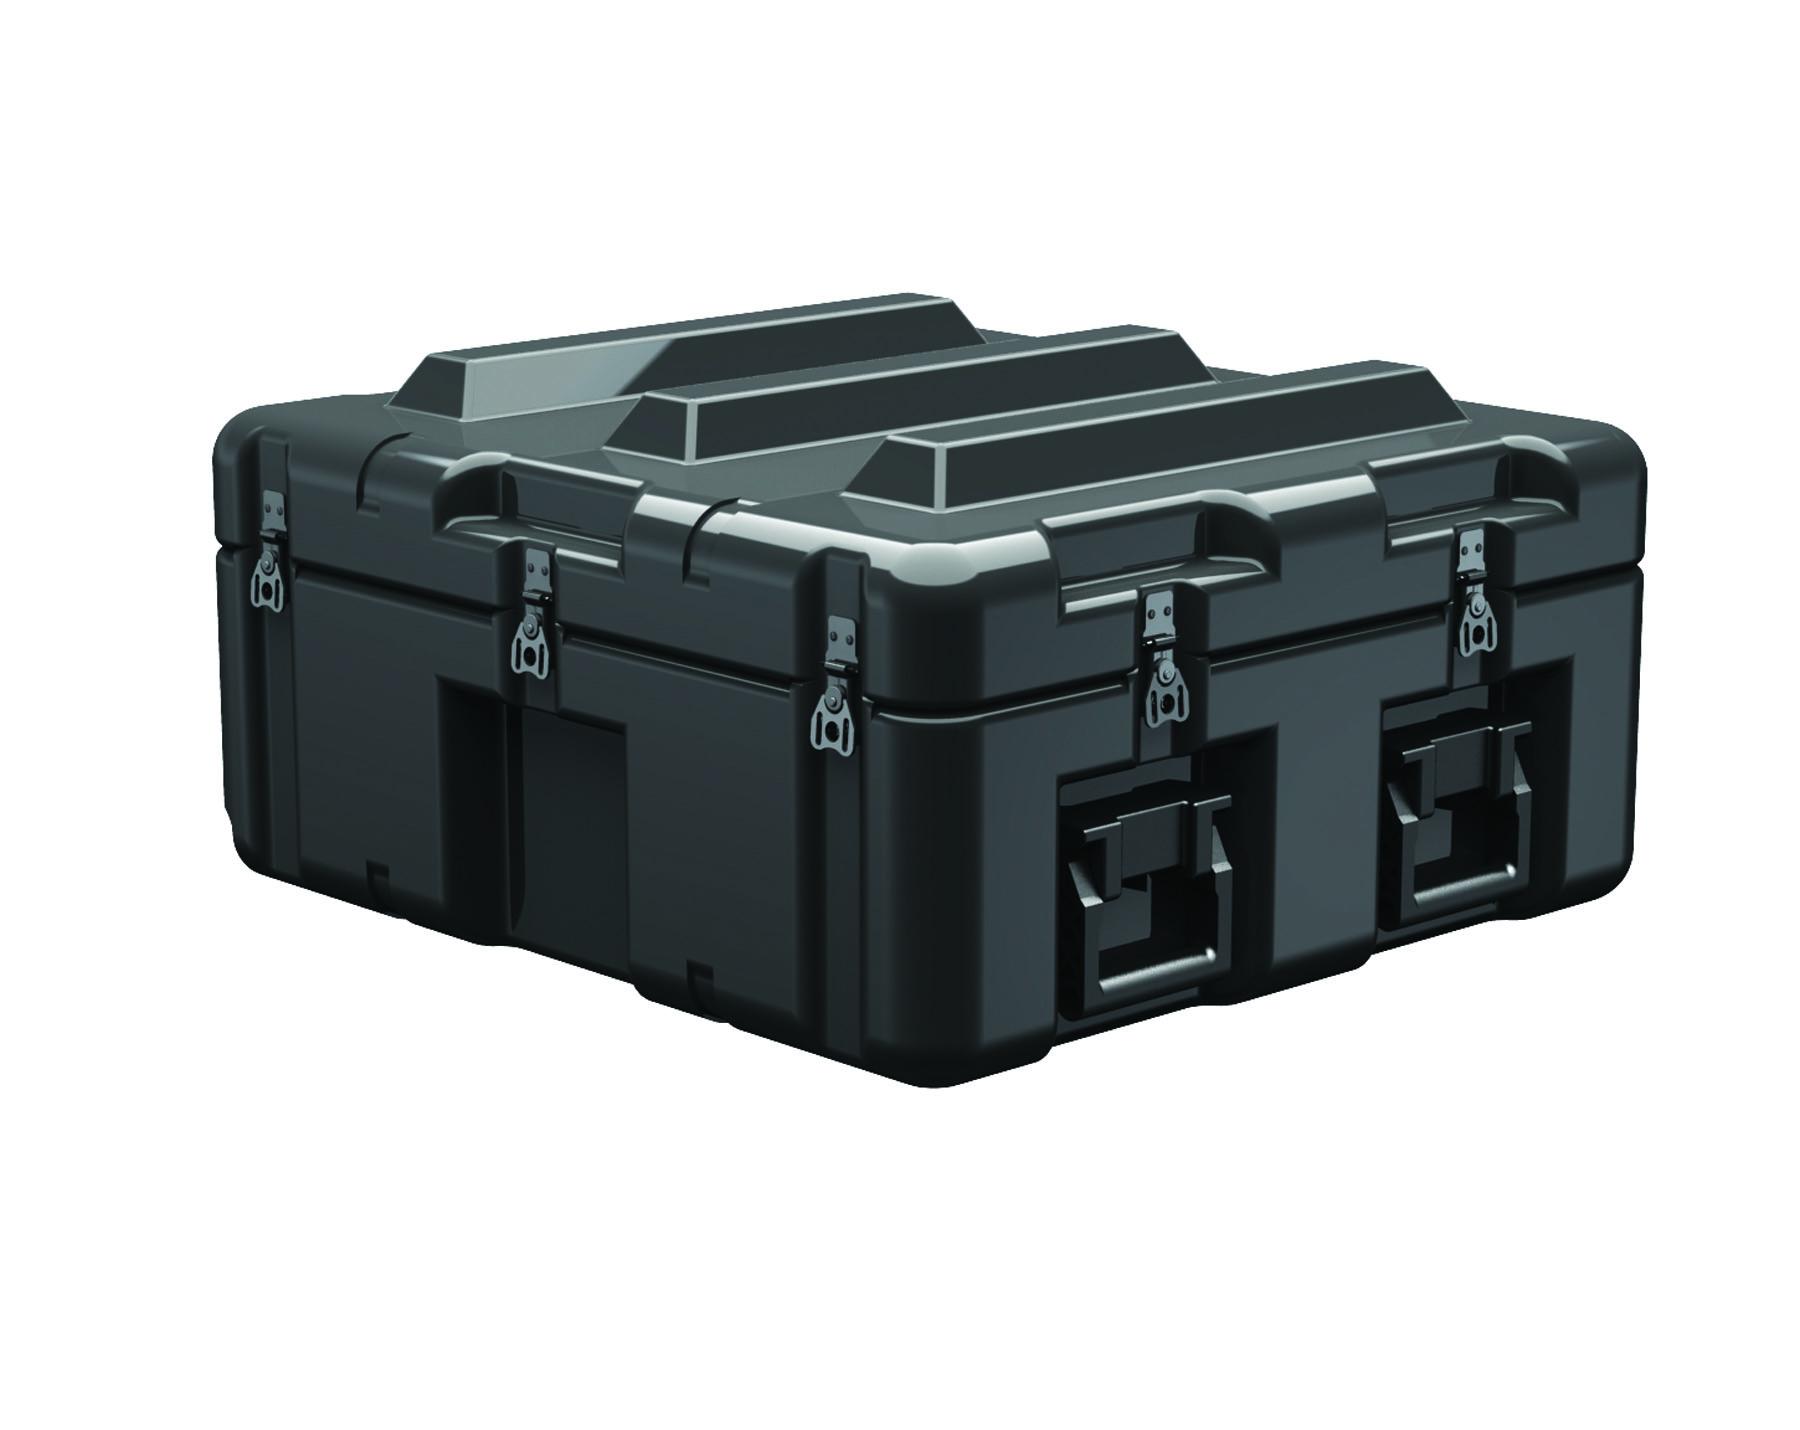 AL2624-0803 - Pelican AL2624-0803 Single Lid Case - CasesTSA